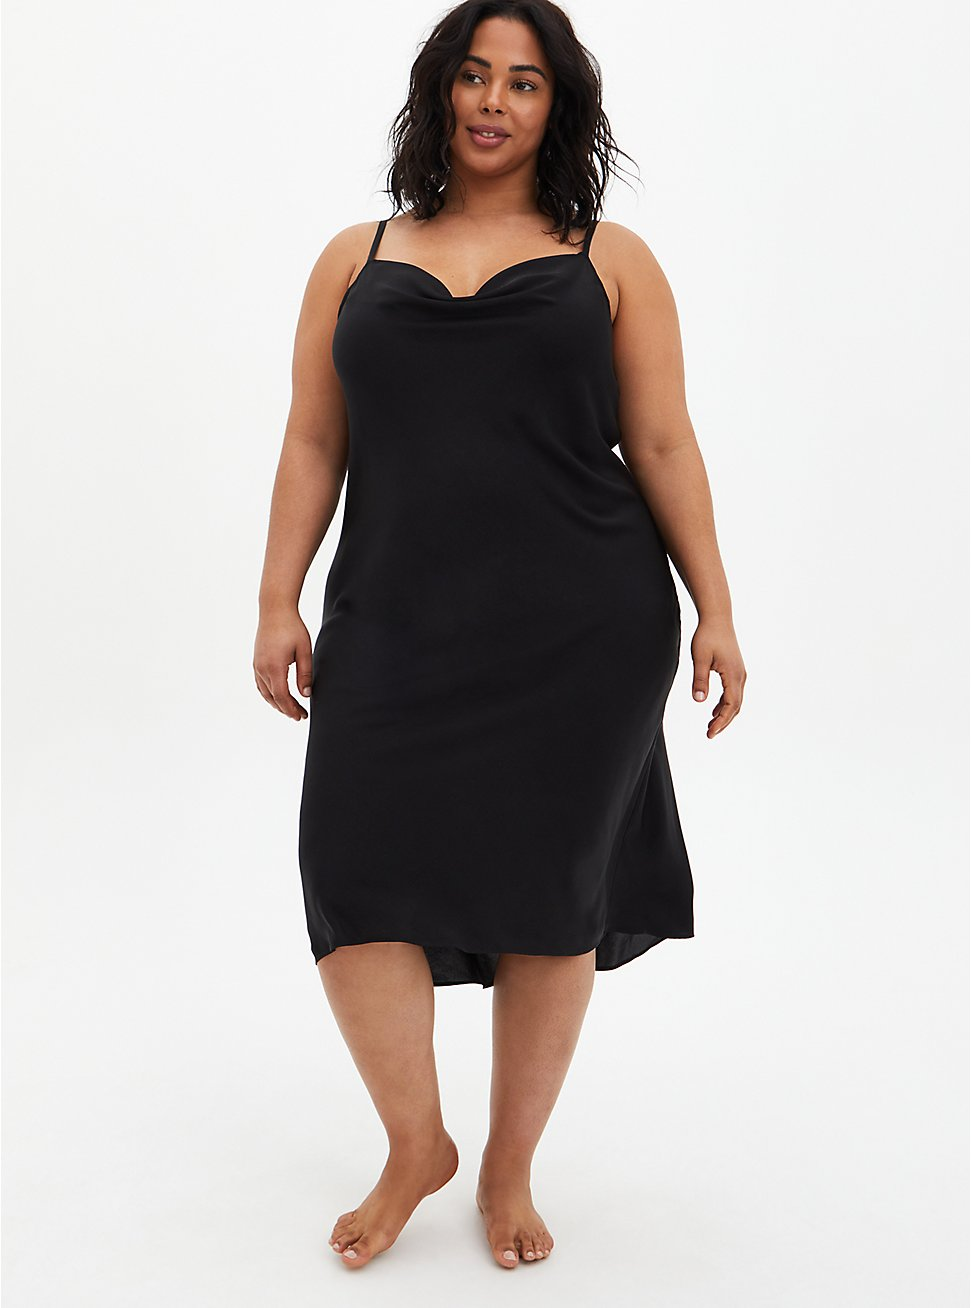 Black Cowl Neck Mid Length Satin Slip, RICH BLACK, hi-res